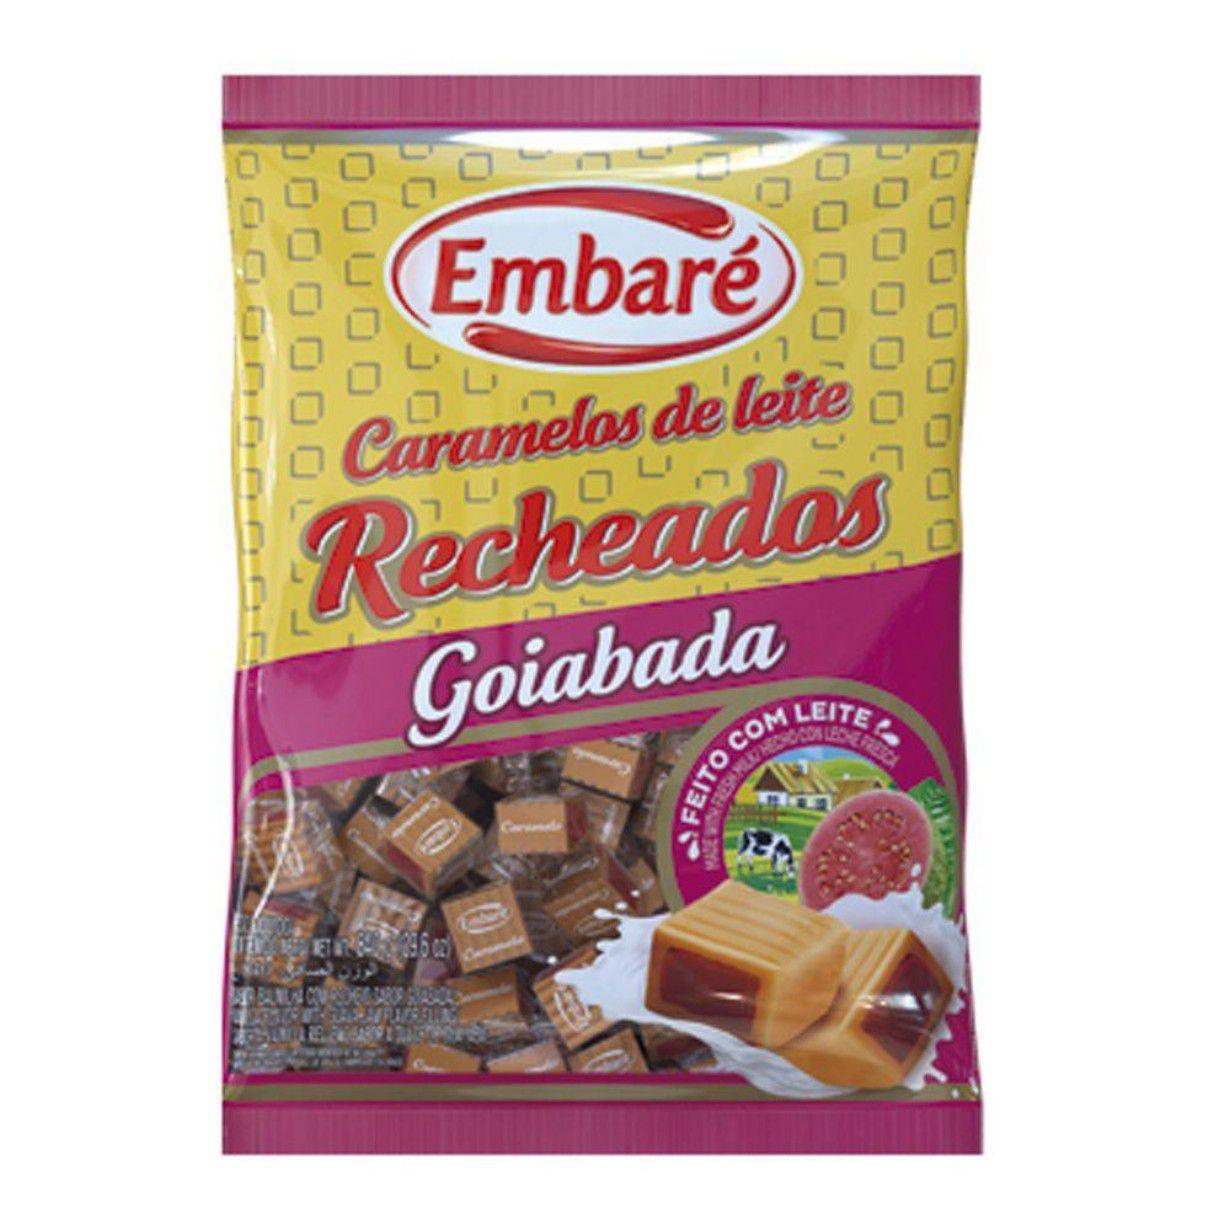 BALA CARAMELO EMBARÉ TRADICIONAL 600G / 660G ESCOLHA O SABOR